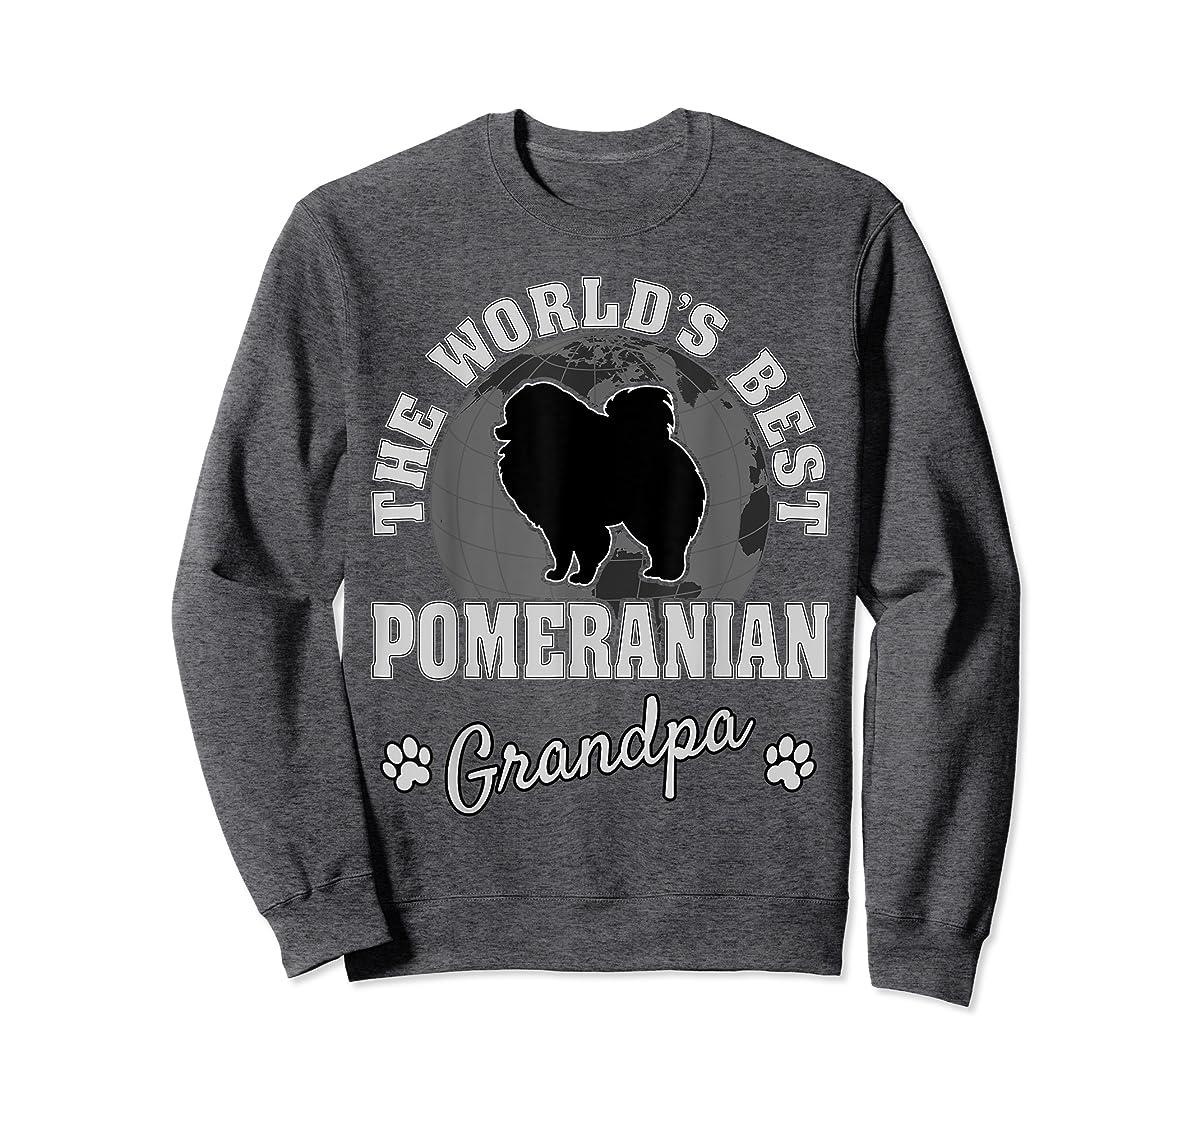 World's Best Pomeranian Grandpa TShirt-Sweatshirt-Dark Heather